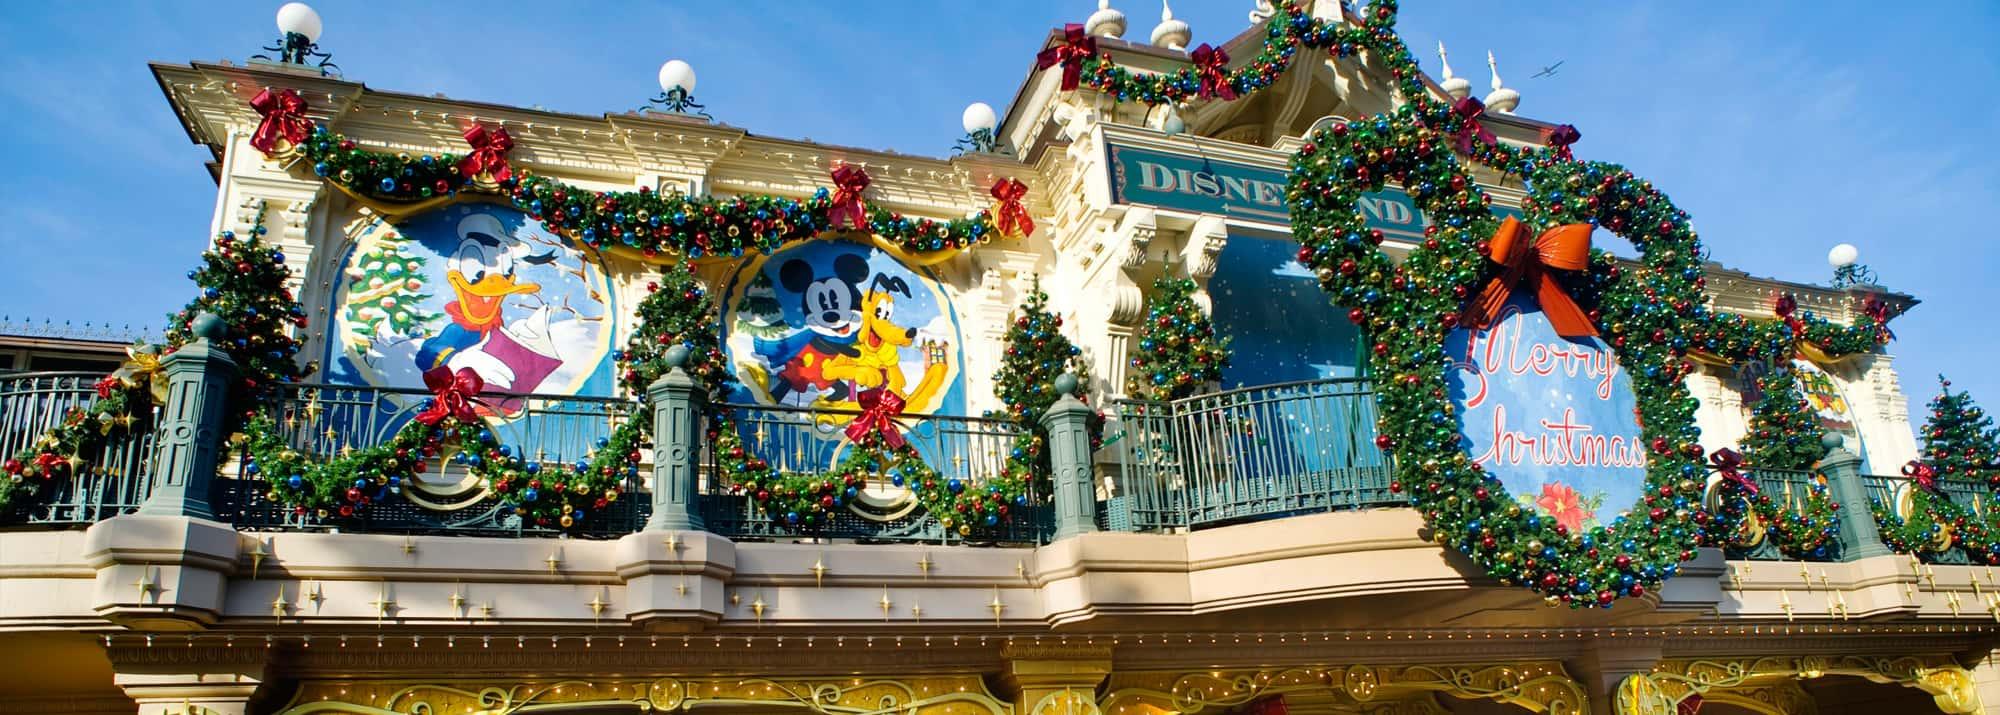 Christmas In Disneyland Paris.Christmas School Trips And Tours To Disneyland Paris France